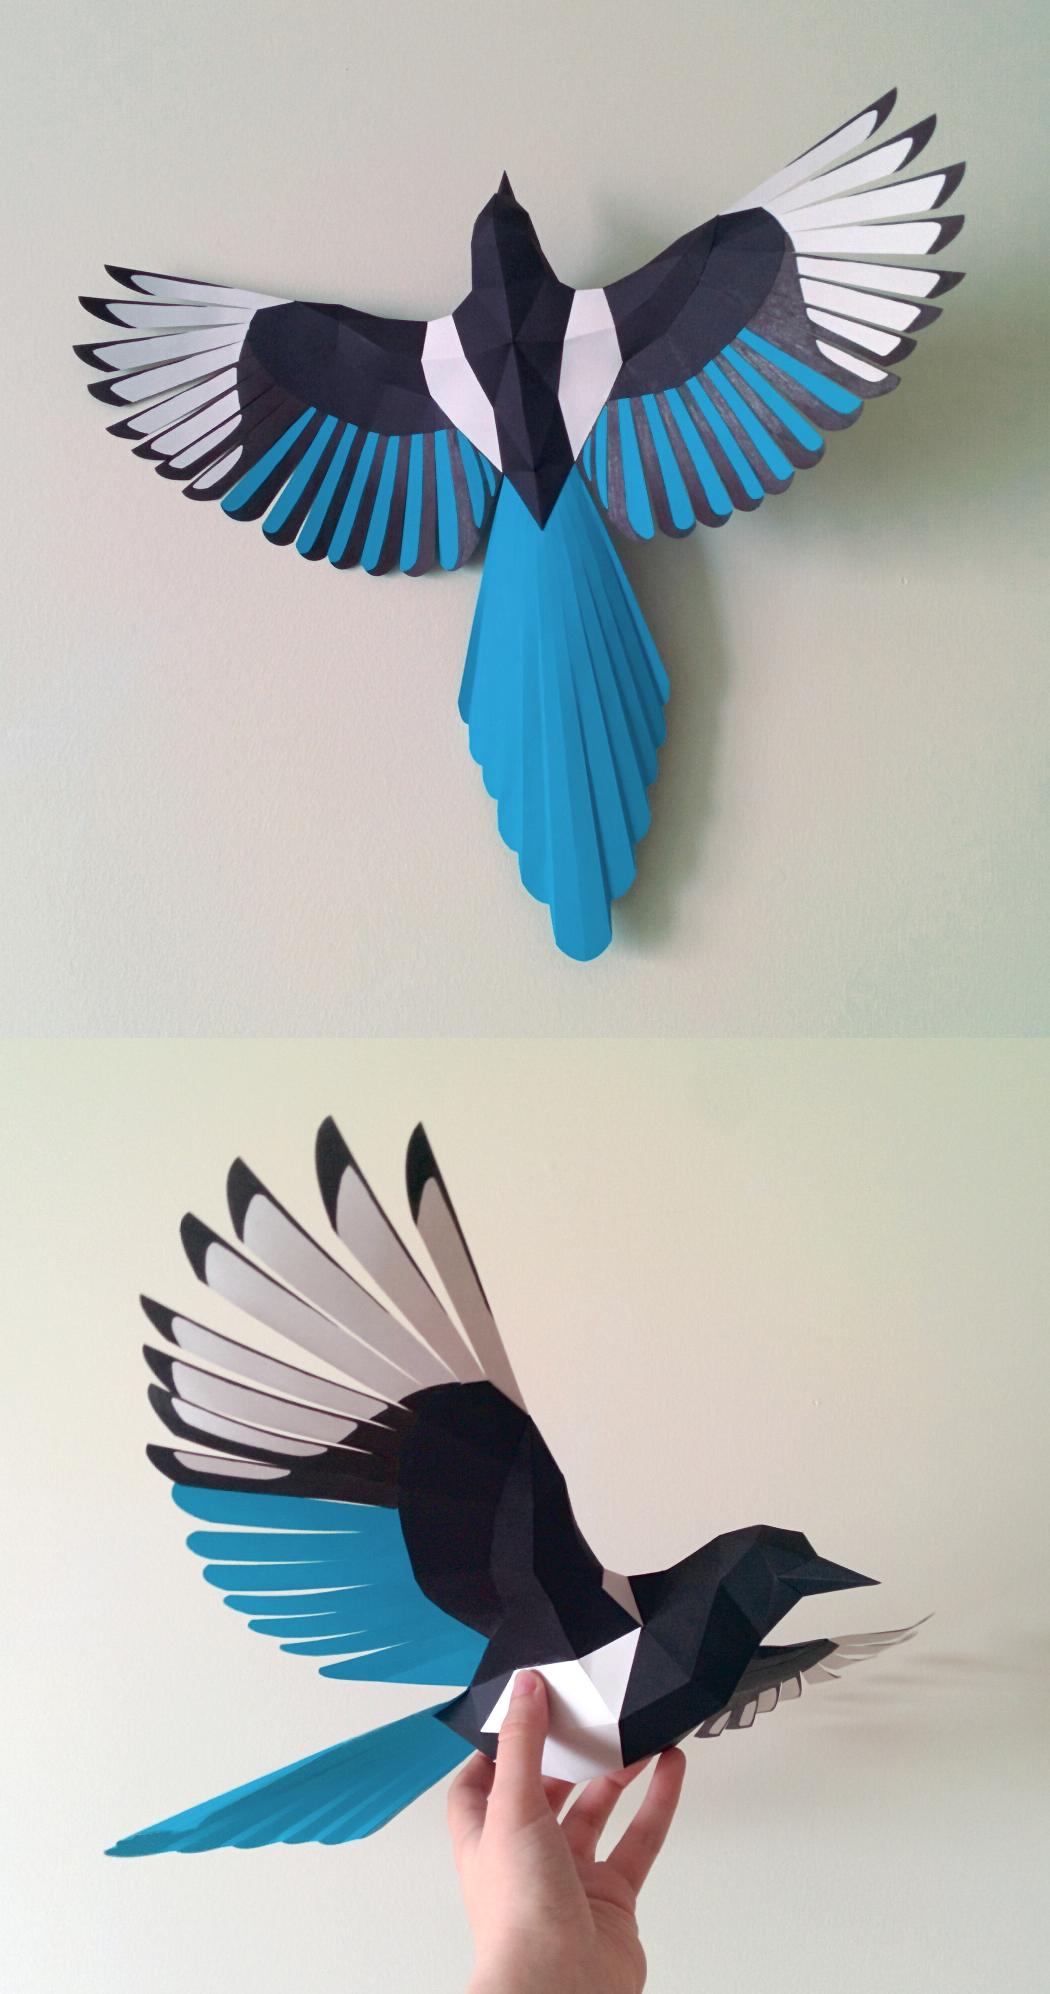 Pin By Anupam Sahoo On Creative Paper Crafts Origami Art Bird Curler Diagram Kusudama Me Craftsorigami Pinterest Beautiful Made Of